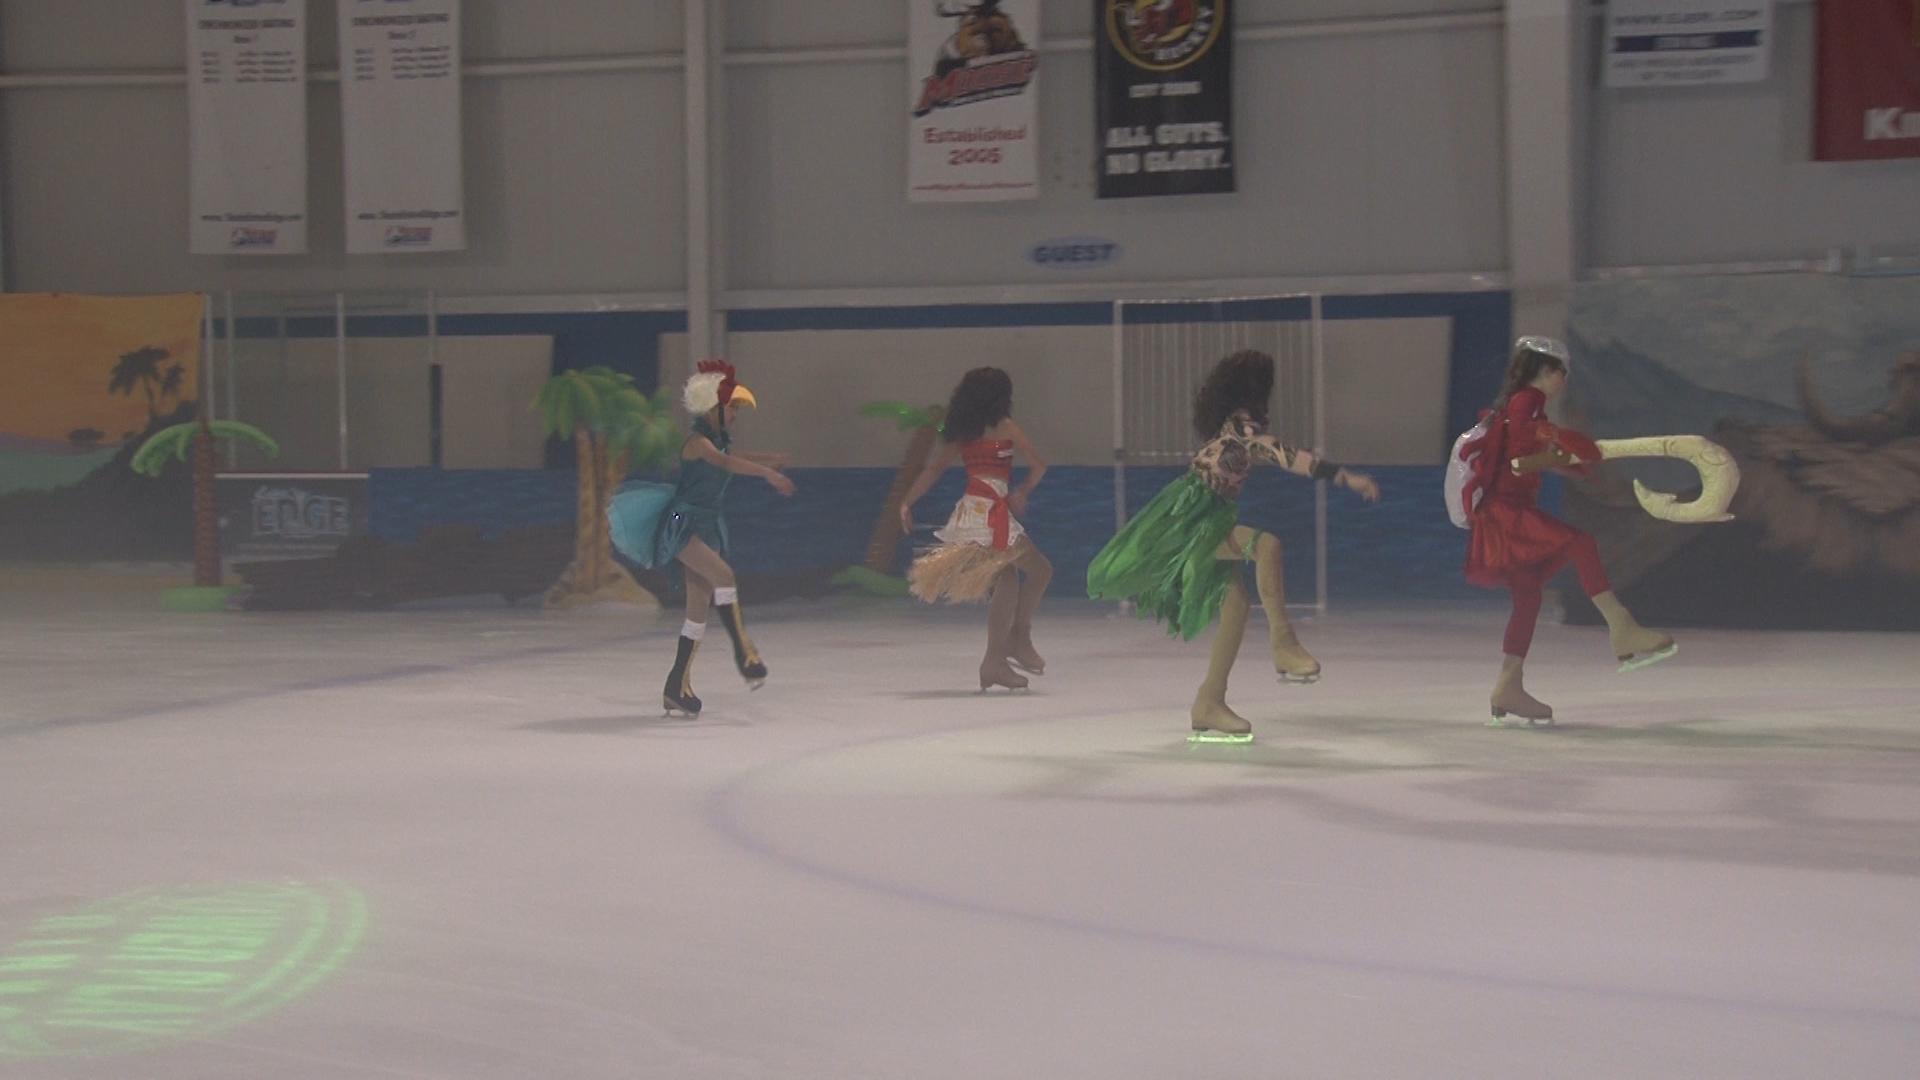 Power Play Maui Skate on Ice 071417.00_43_34_20.Still065.jpg